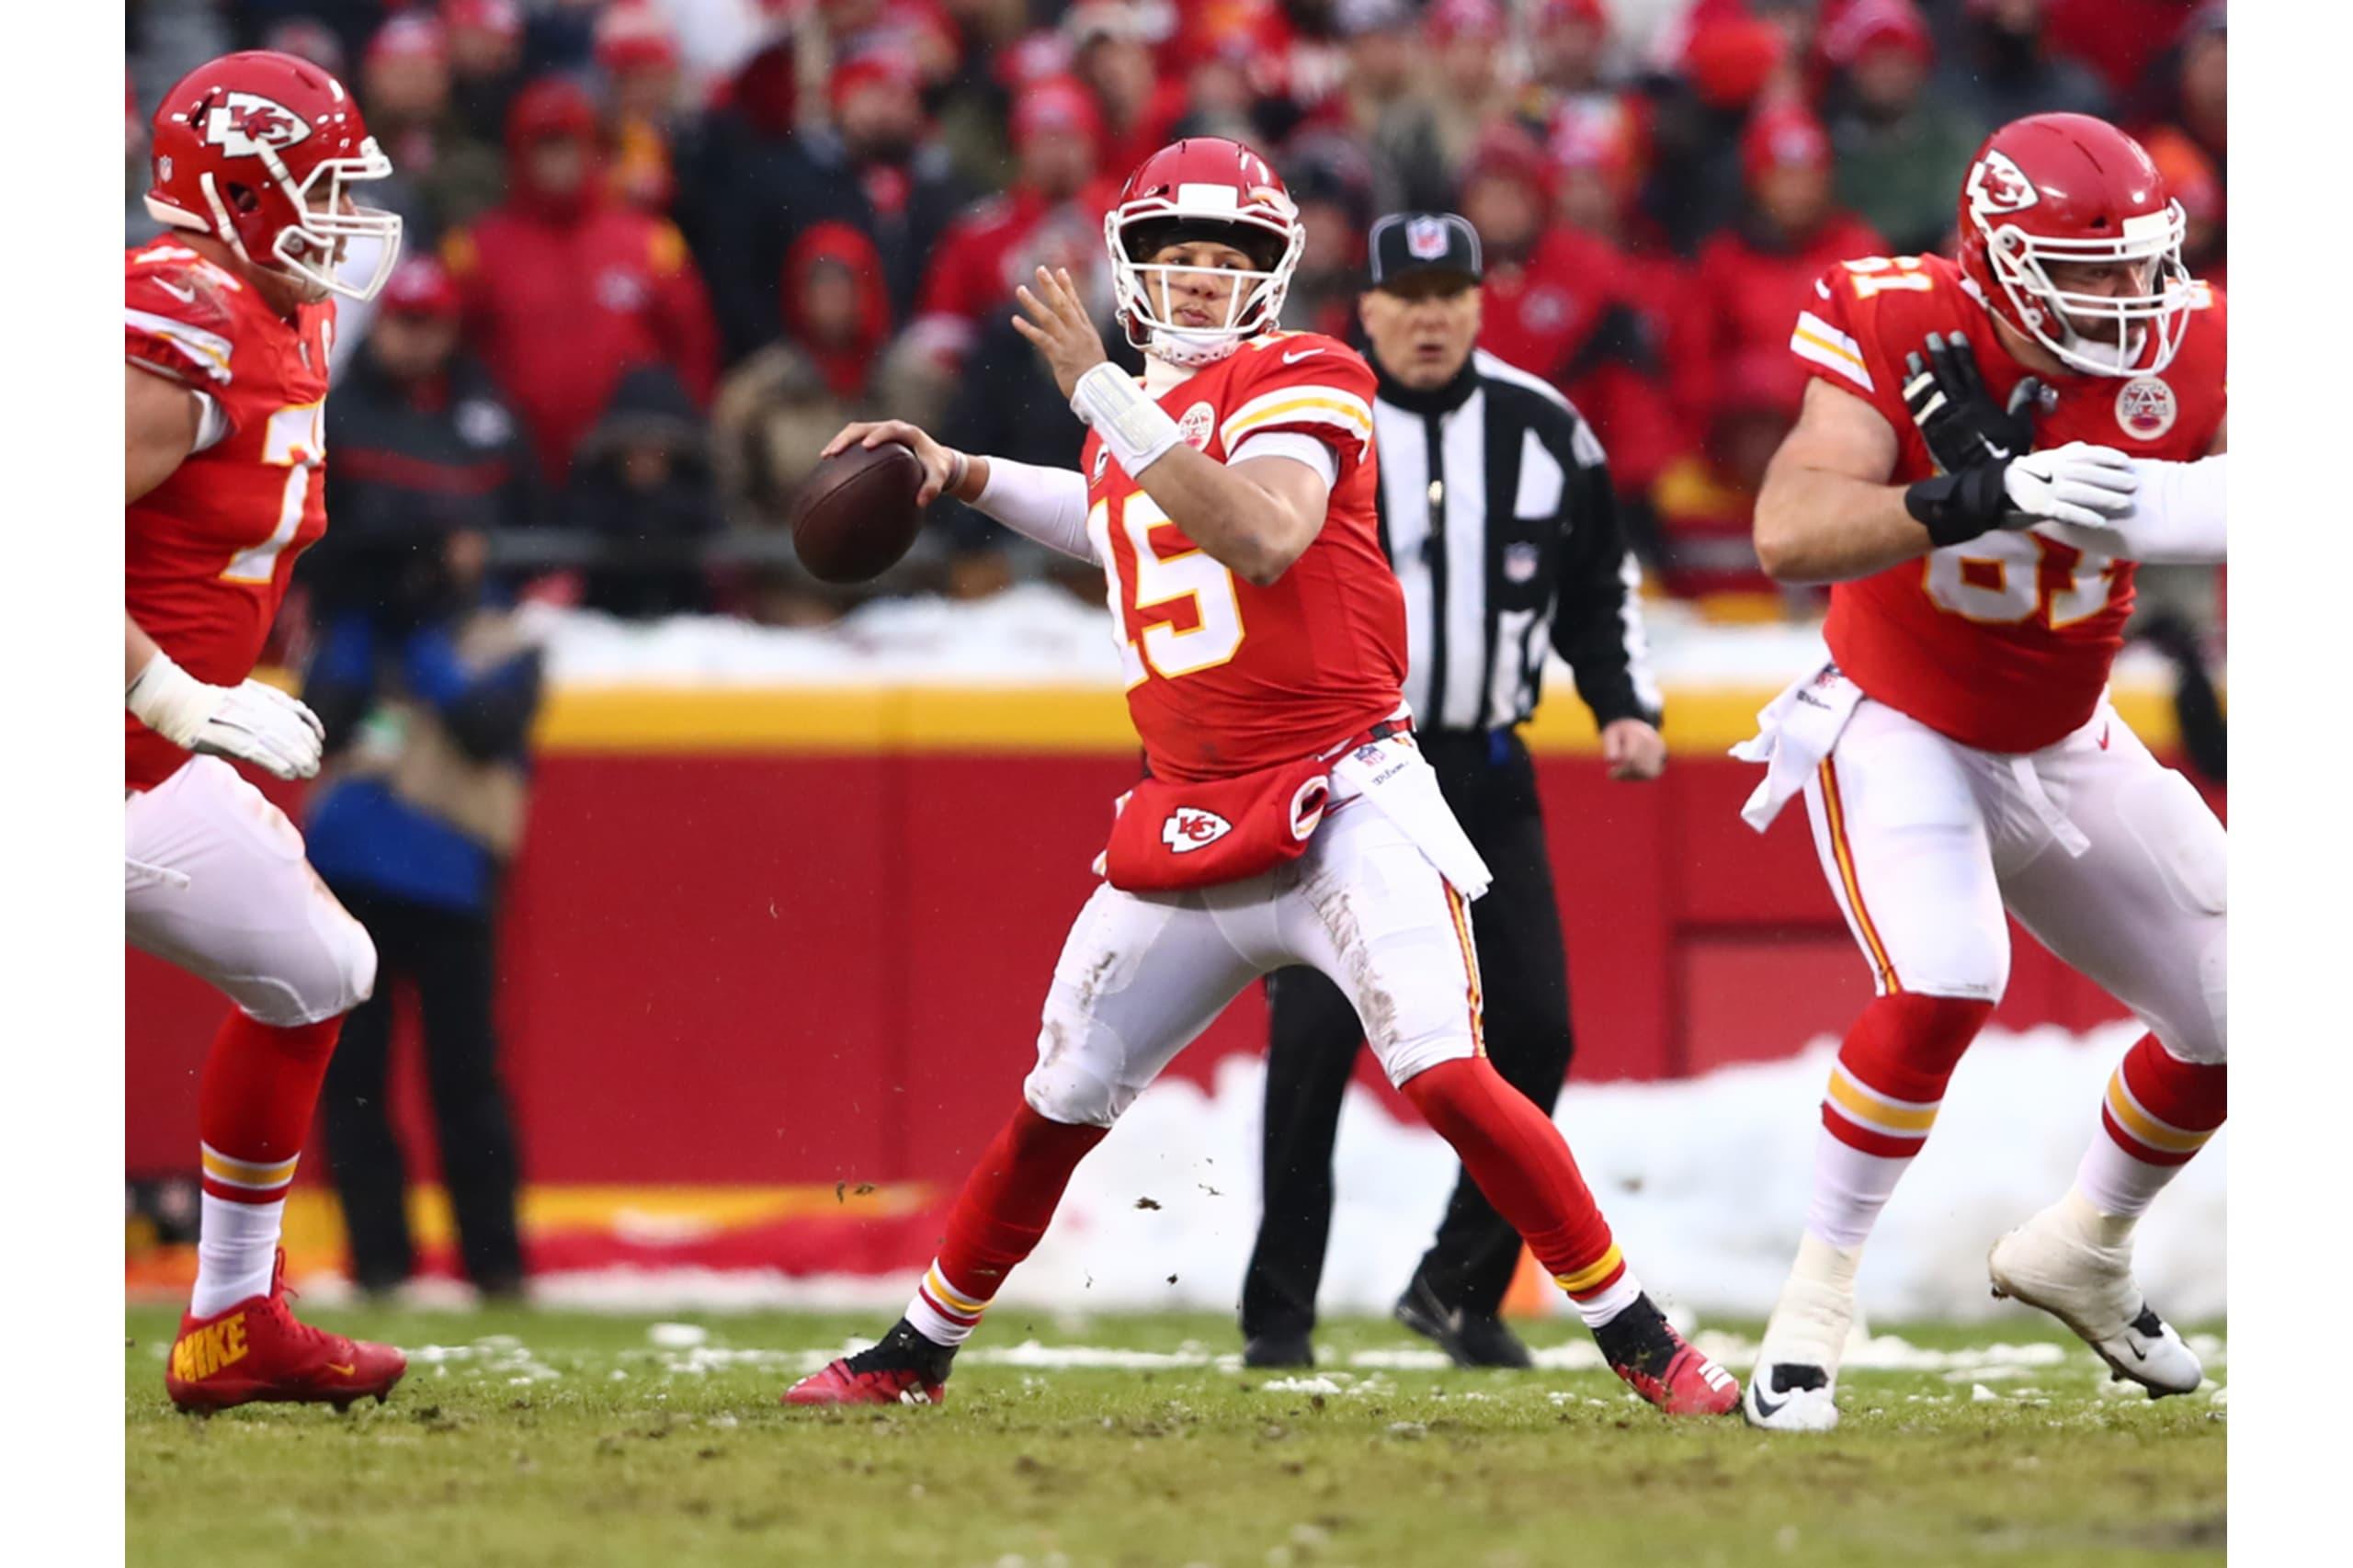 Kansas City Chiefs enter defining moment against the Patriots